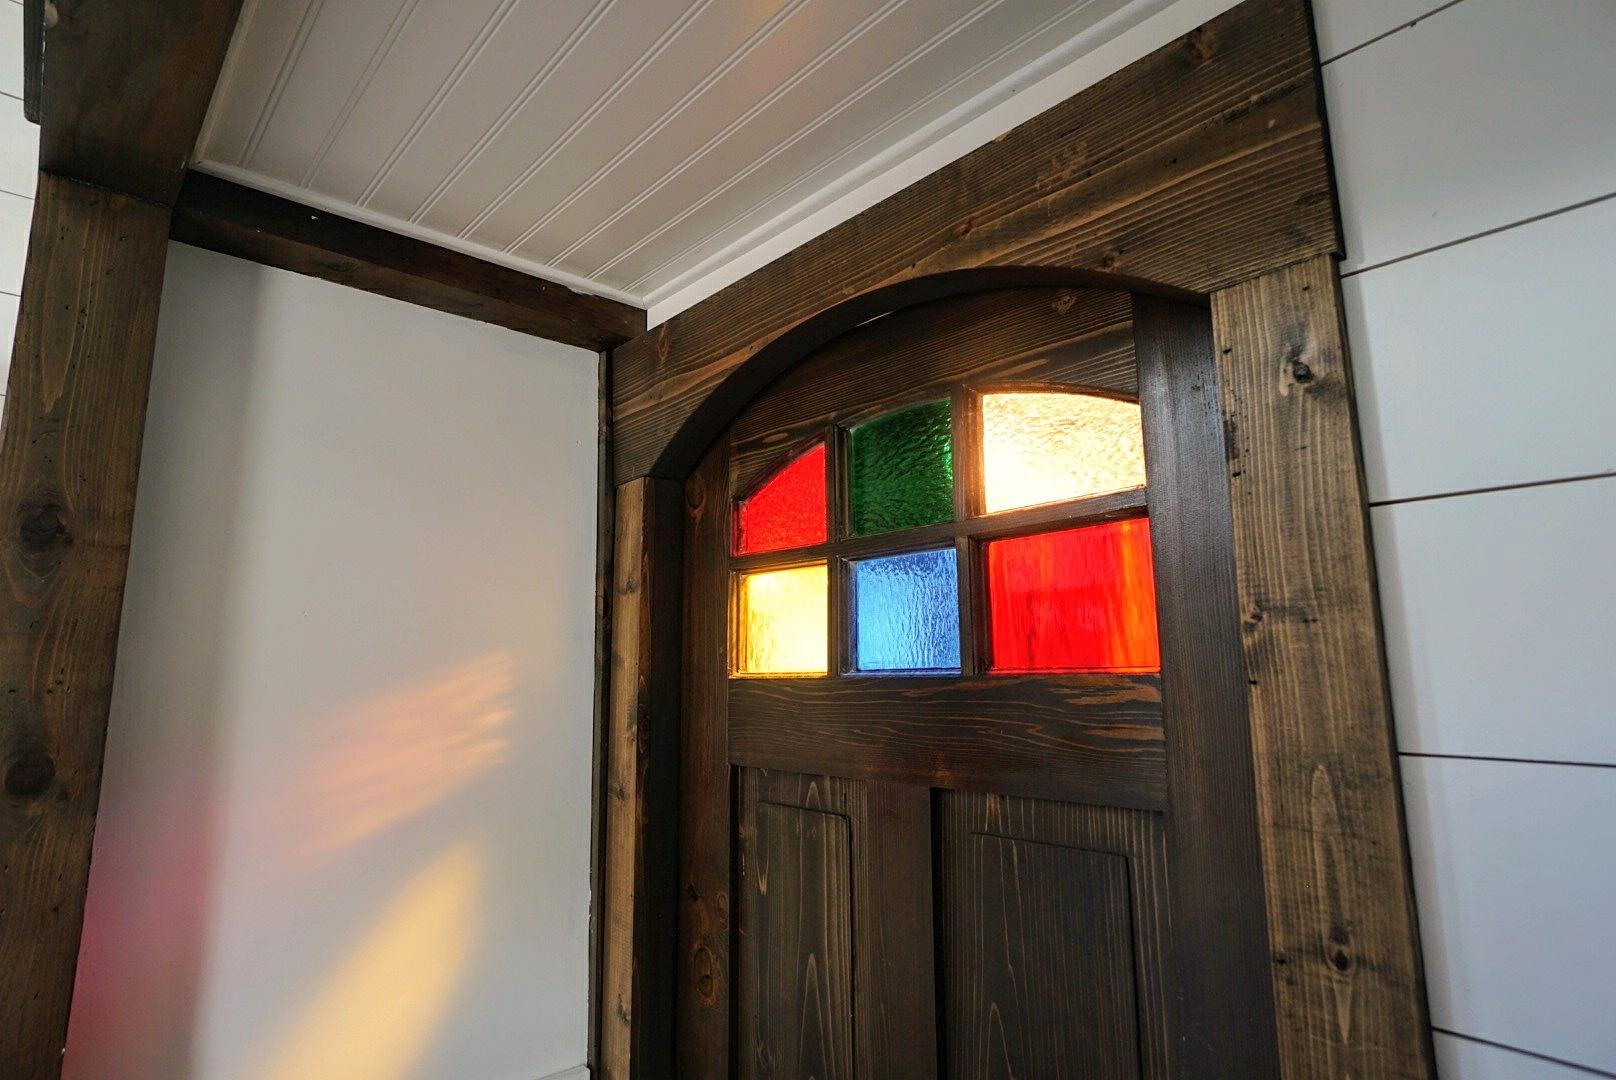 Tiny home Lighting LED bulb size lighting techniques LED tape lighting stain glass windows